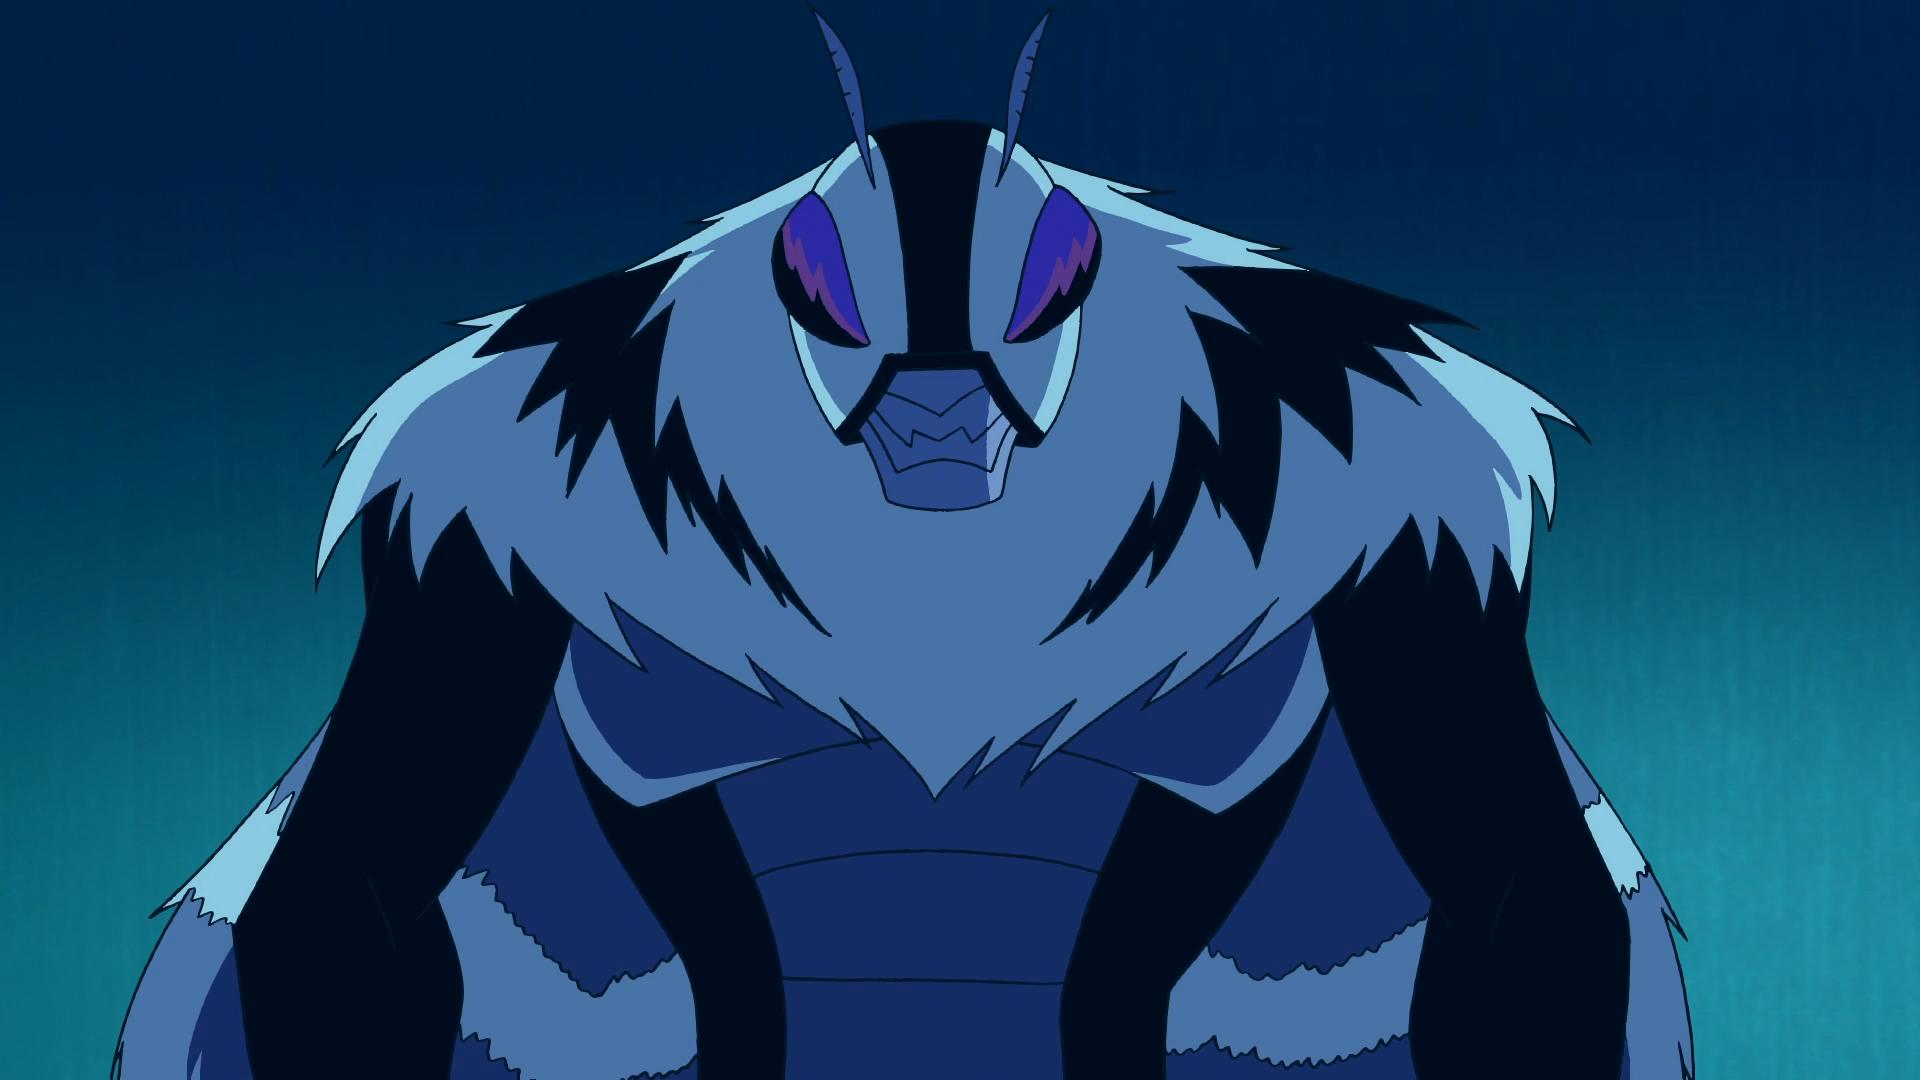 Killer Moth (Teen Titans TV Series)